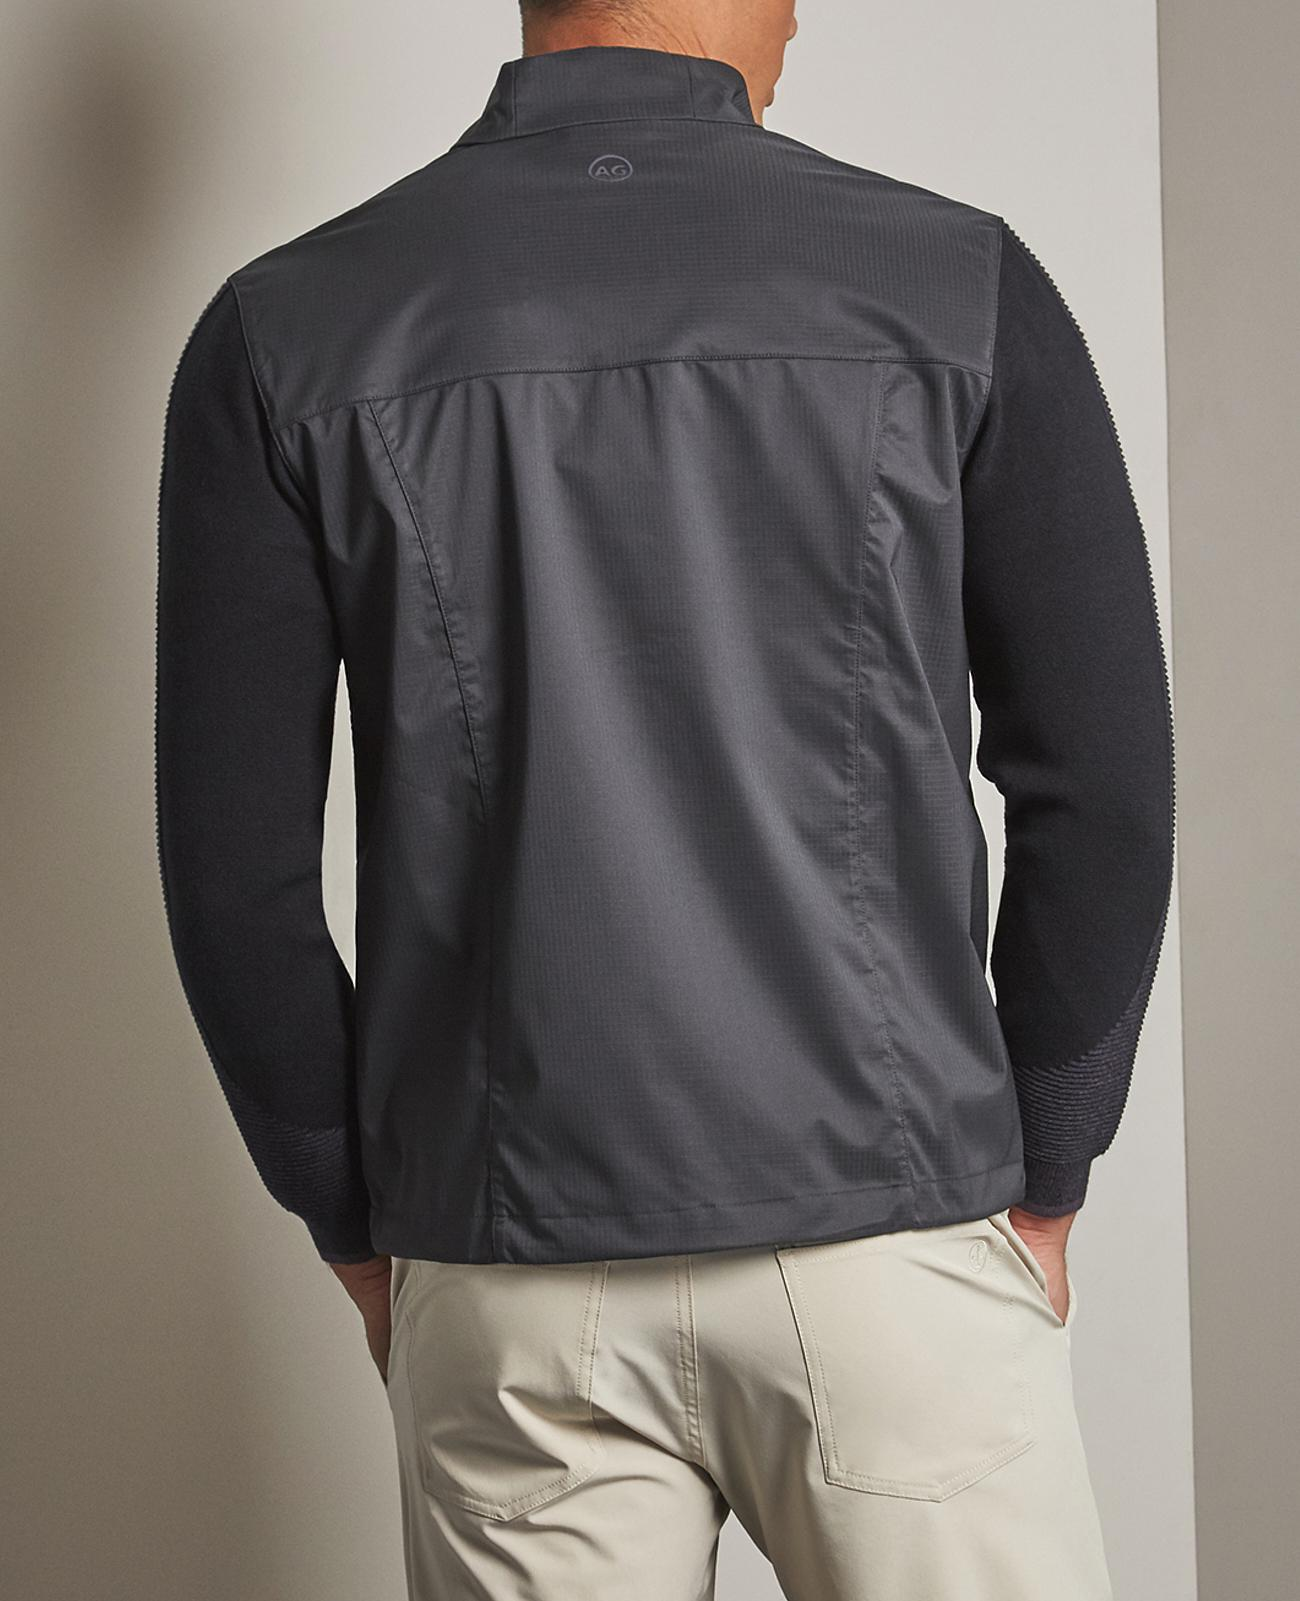 The Kendrick Jacket